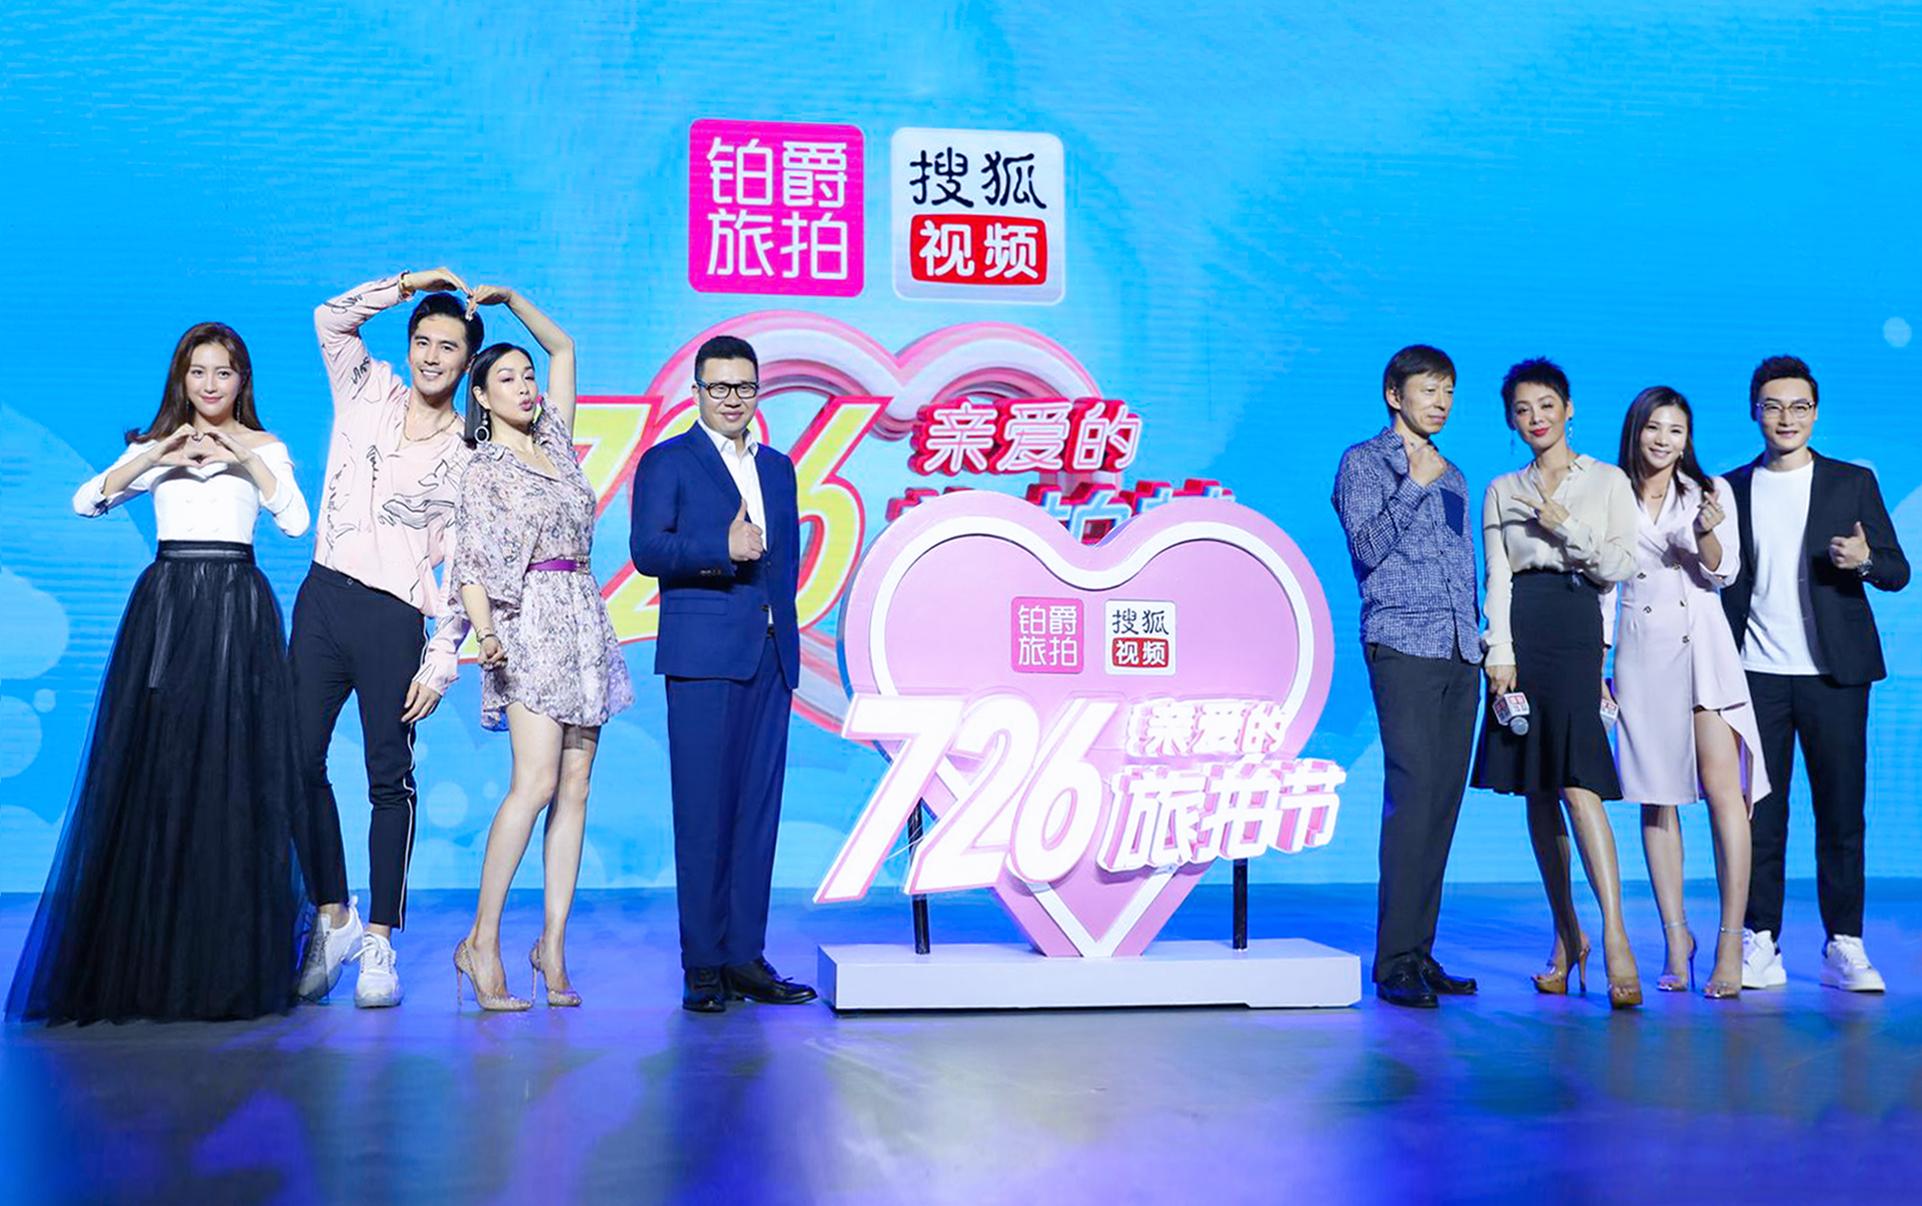 "<b>搜狐视频联合铂爵旅拍发起""726亲爱的旅拍节"" 甜宠型内容营销升温</b>"